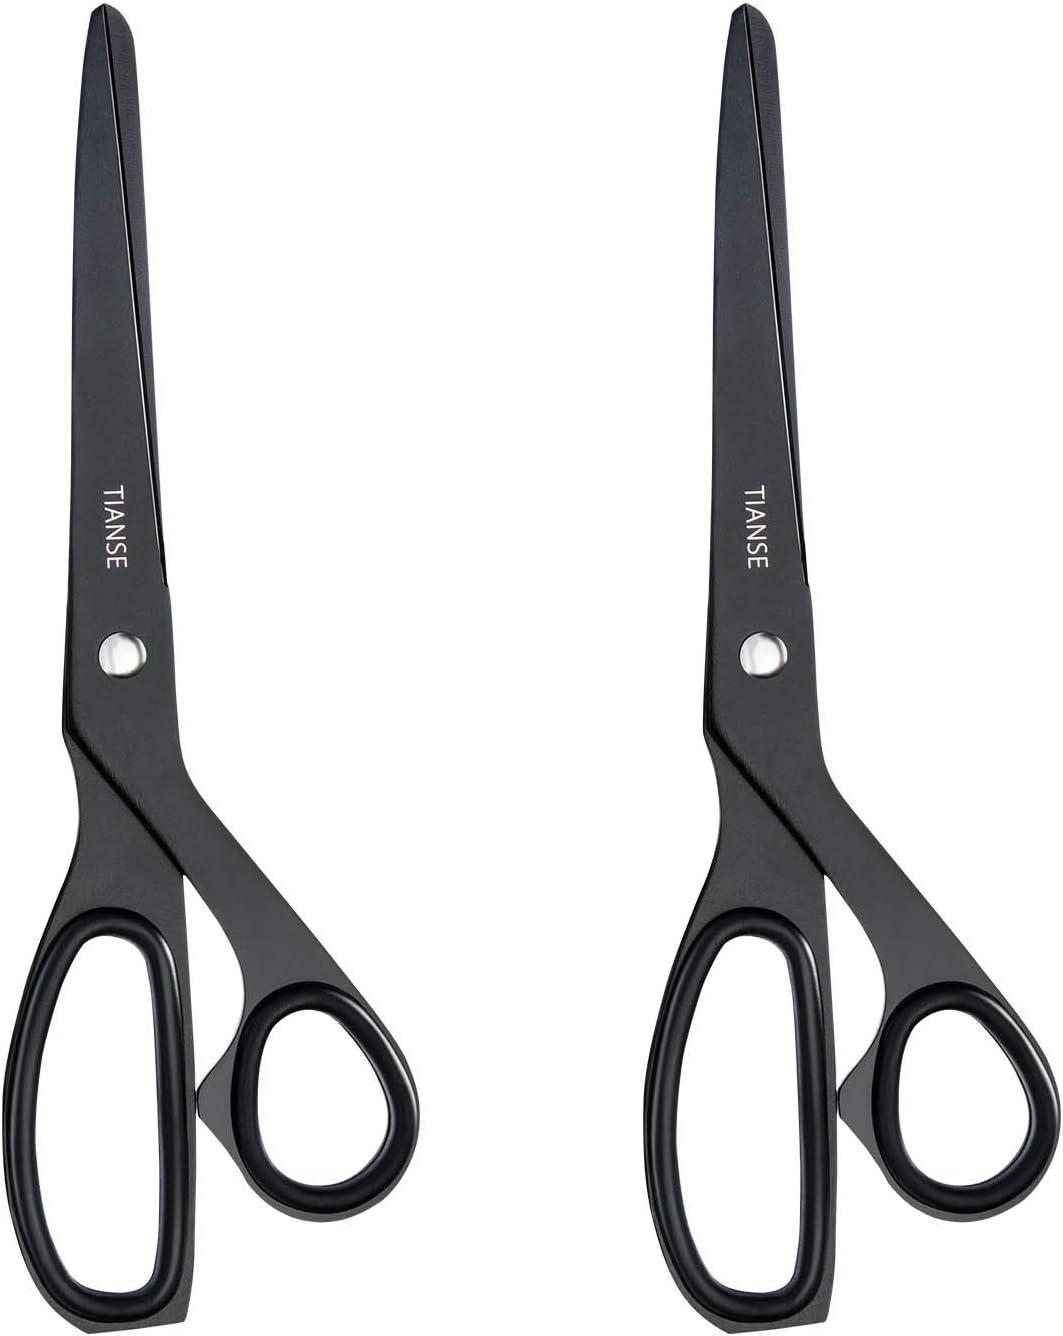 TIANSE 8-inch Titanium Scissor Soft-Grip Straight Bonded Scissors for School Office Home Use ,2-Pack Matt Black